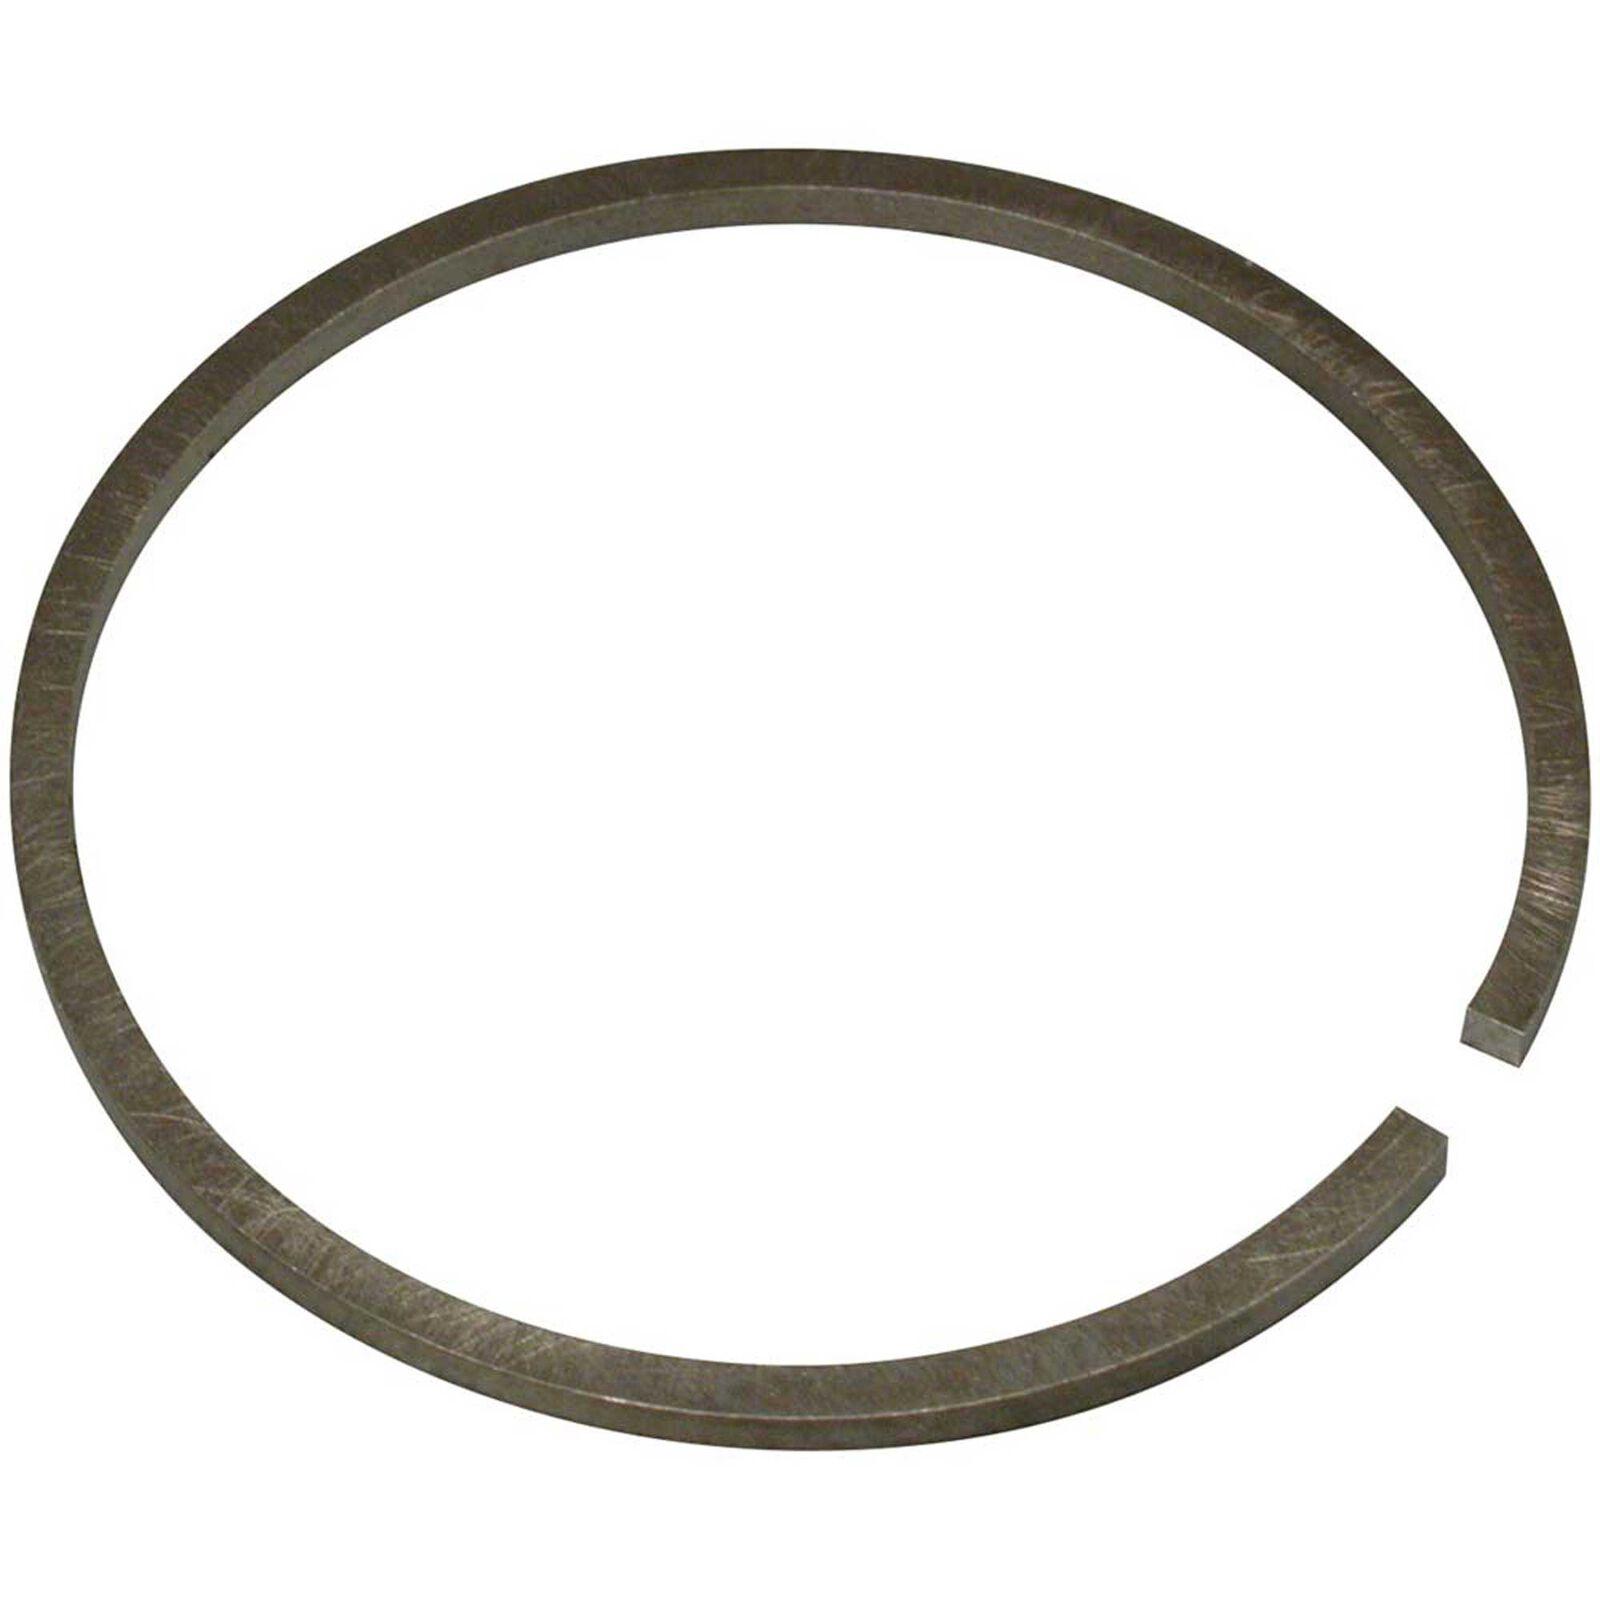 Piston Ring: FS-91-P